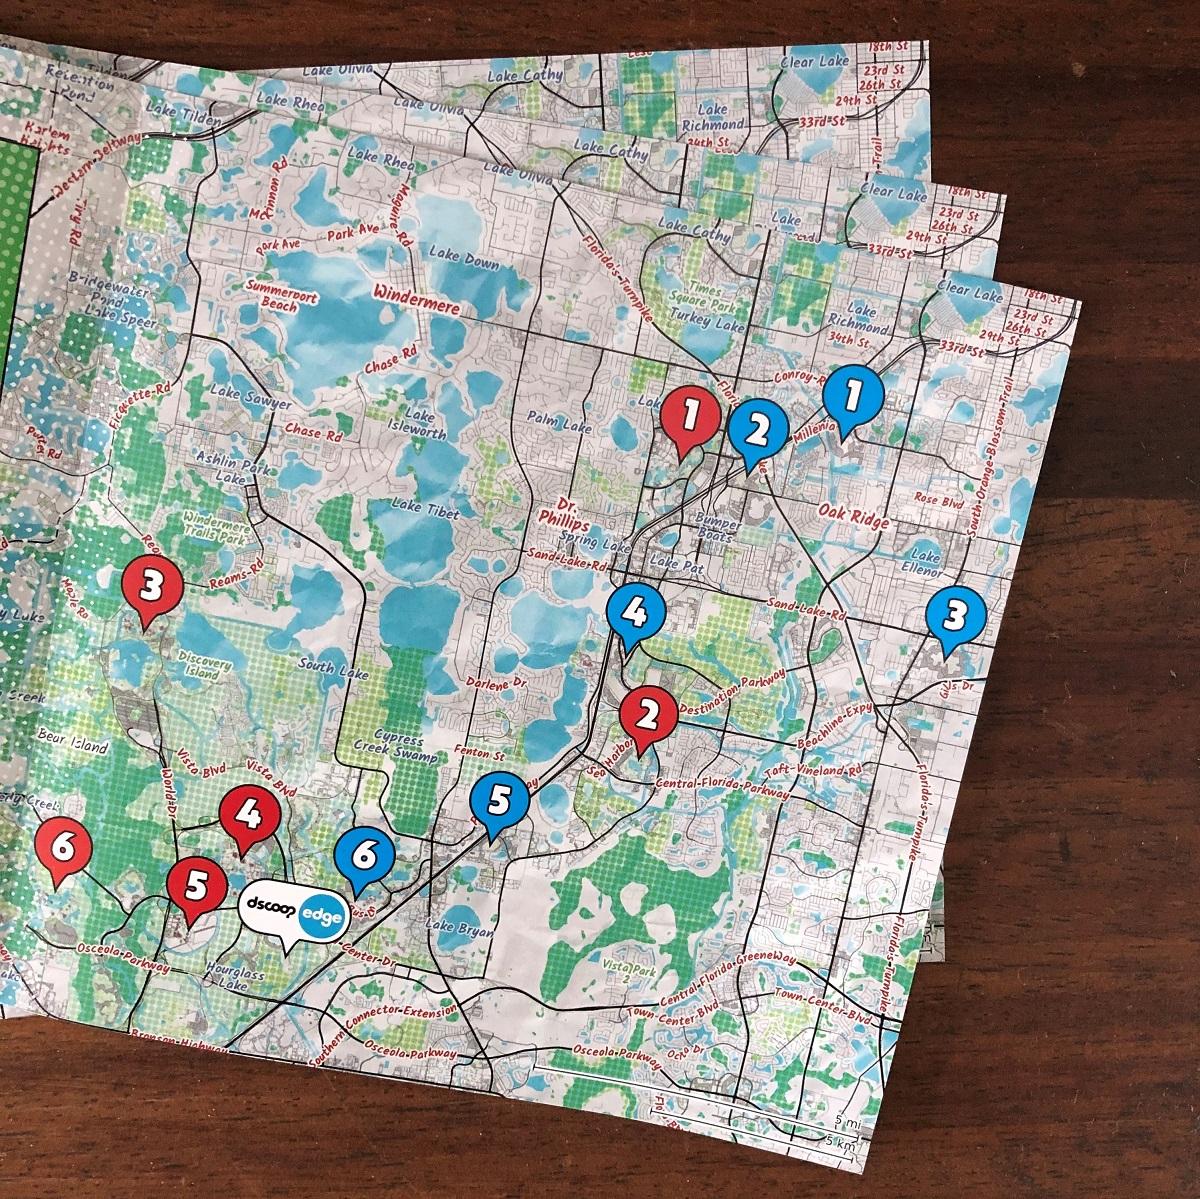 locr maps at Dscoop Orlando 2019